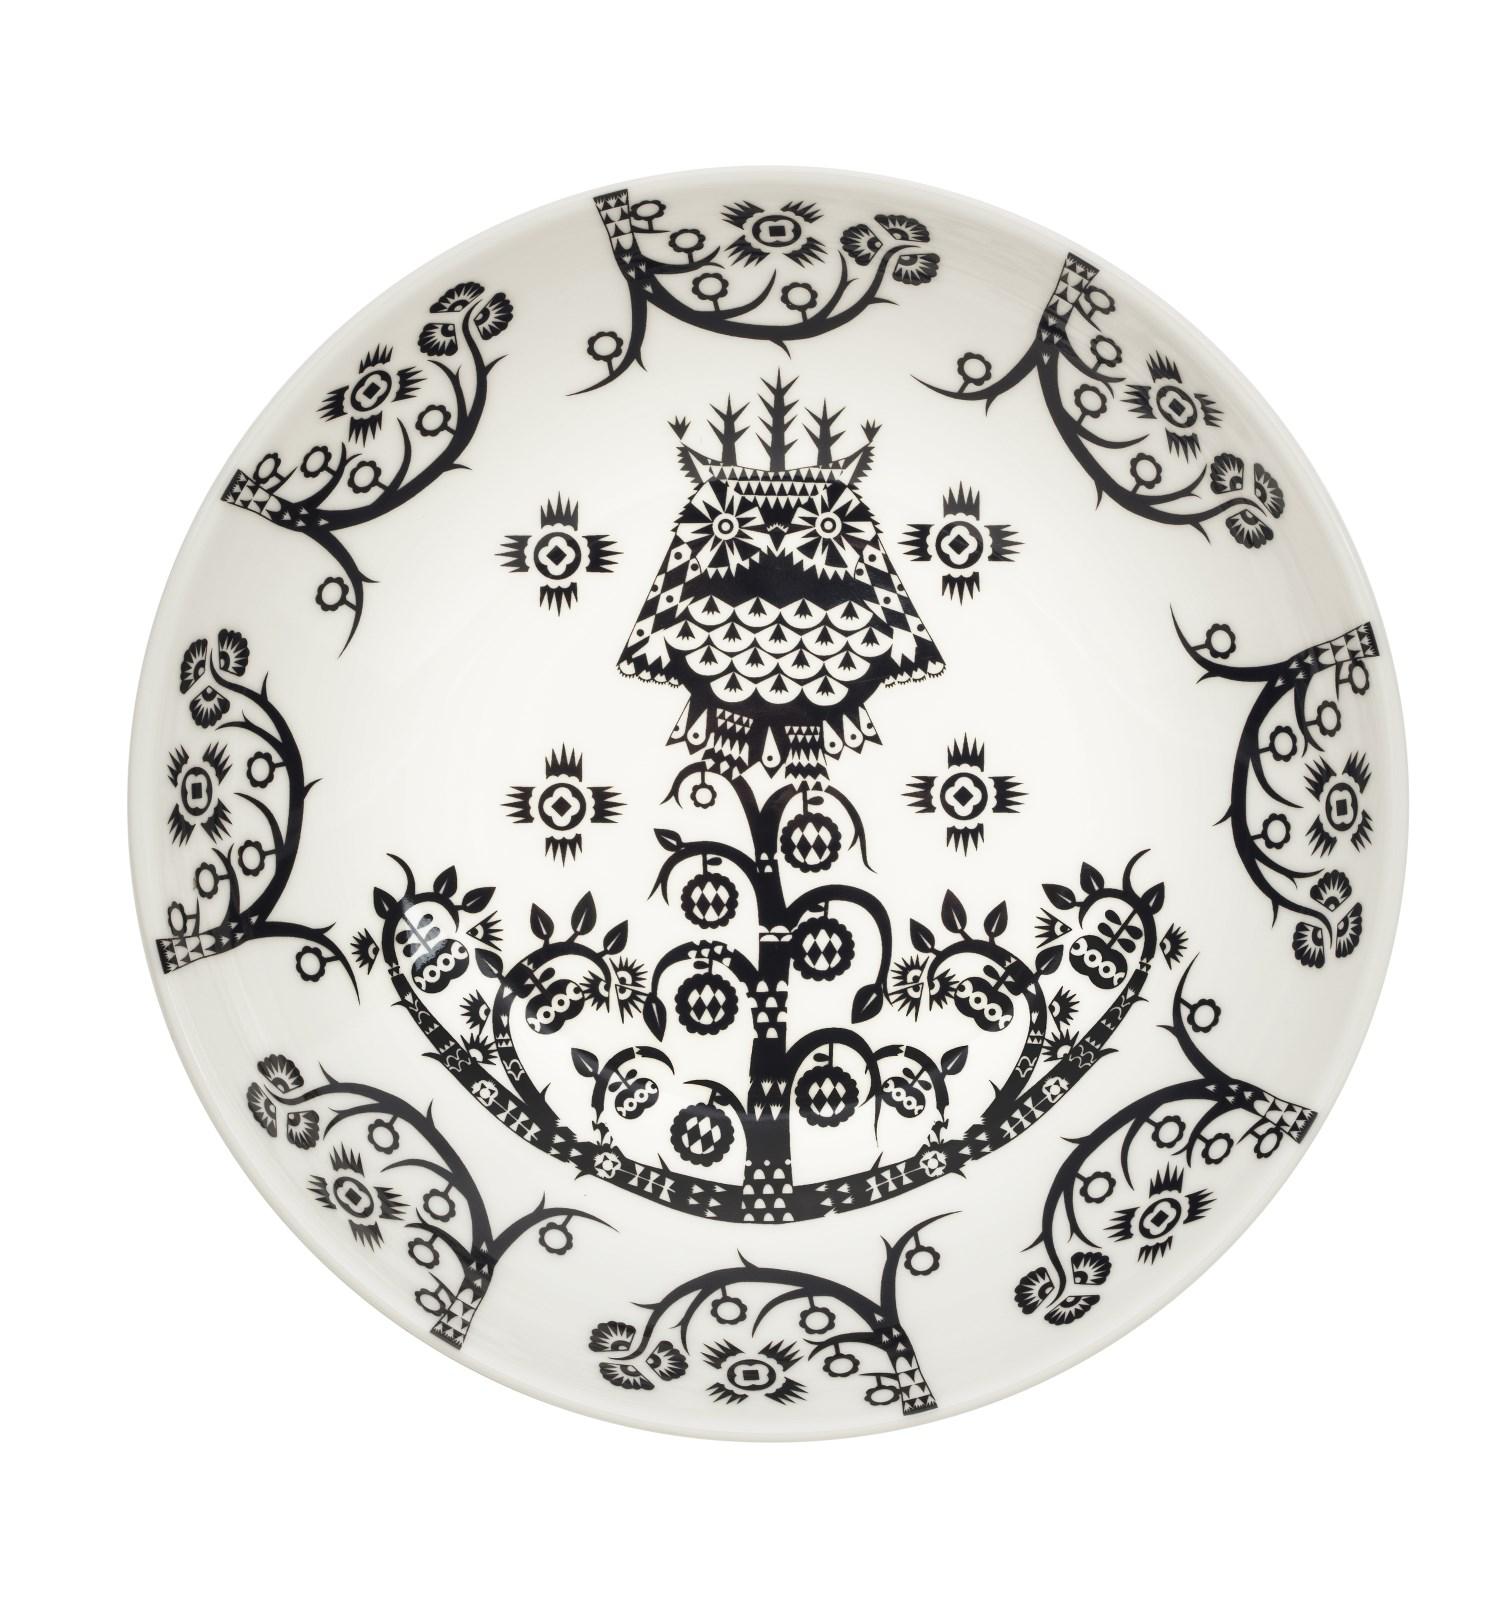 цена на Тарелка глубокая Iittala Taika глубокая с орнаментом, белый